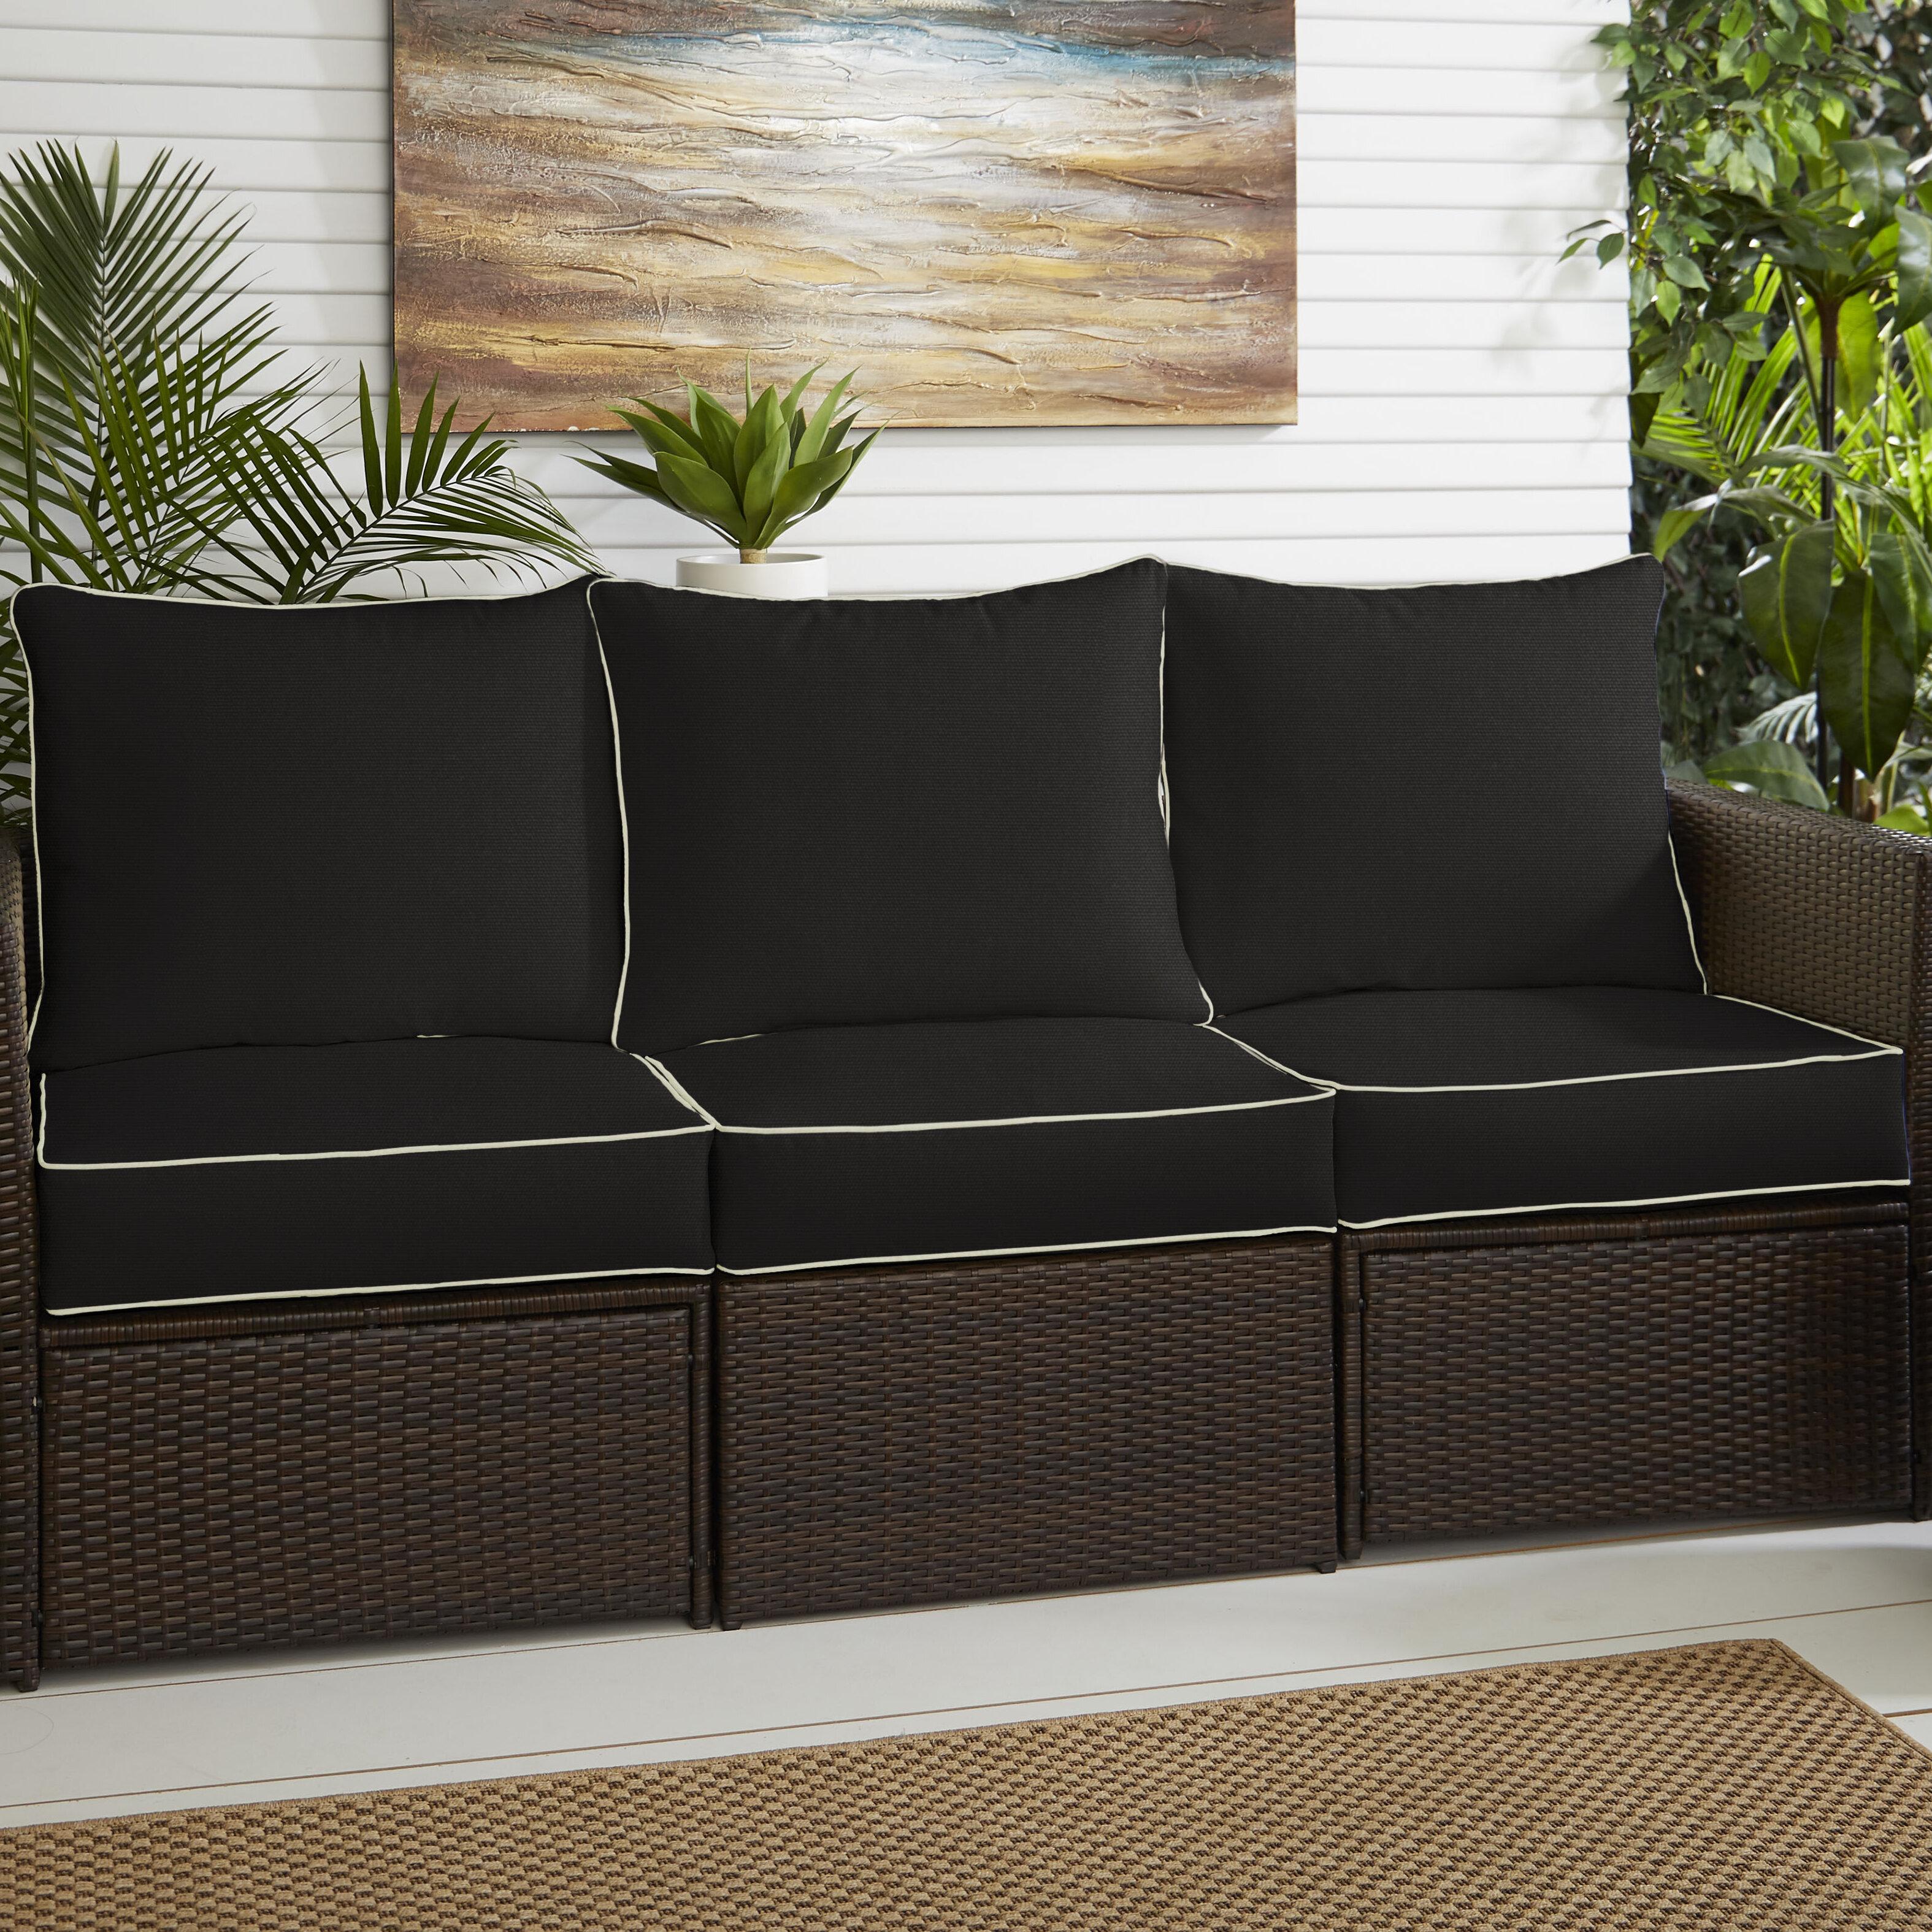 Phenomenal Indoor Outdoor Sunbrella Loveseat Sofa Cushion Short Links Chair Design For Home Short Linksinfo